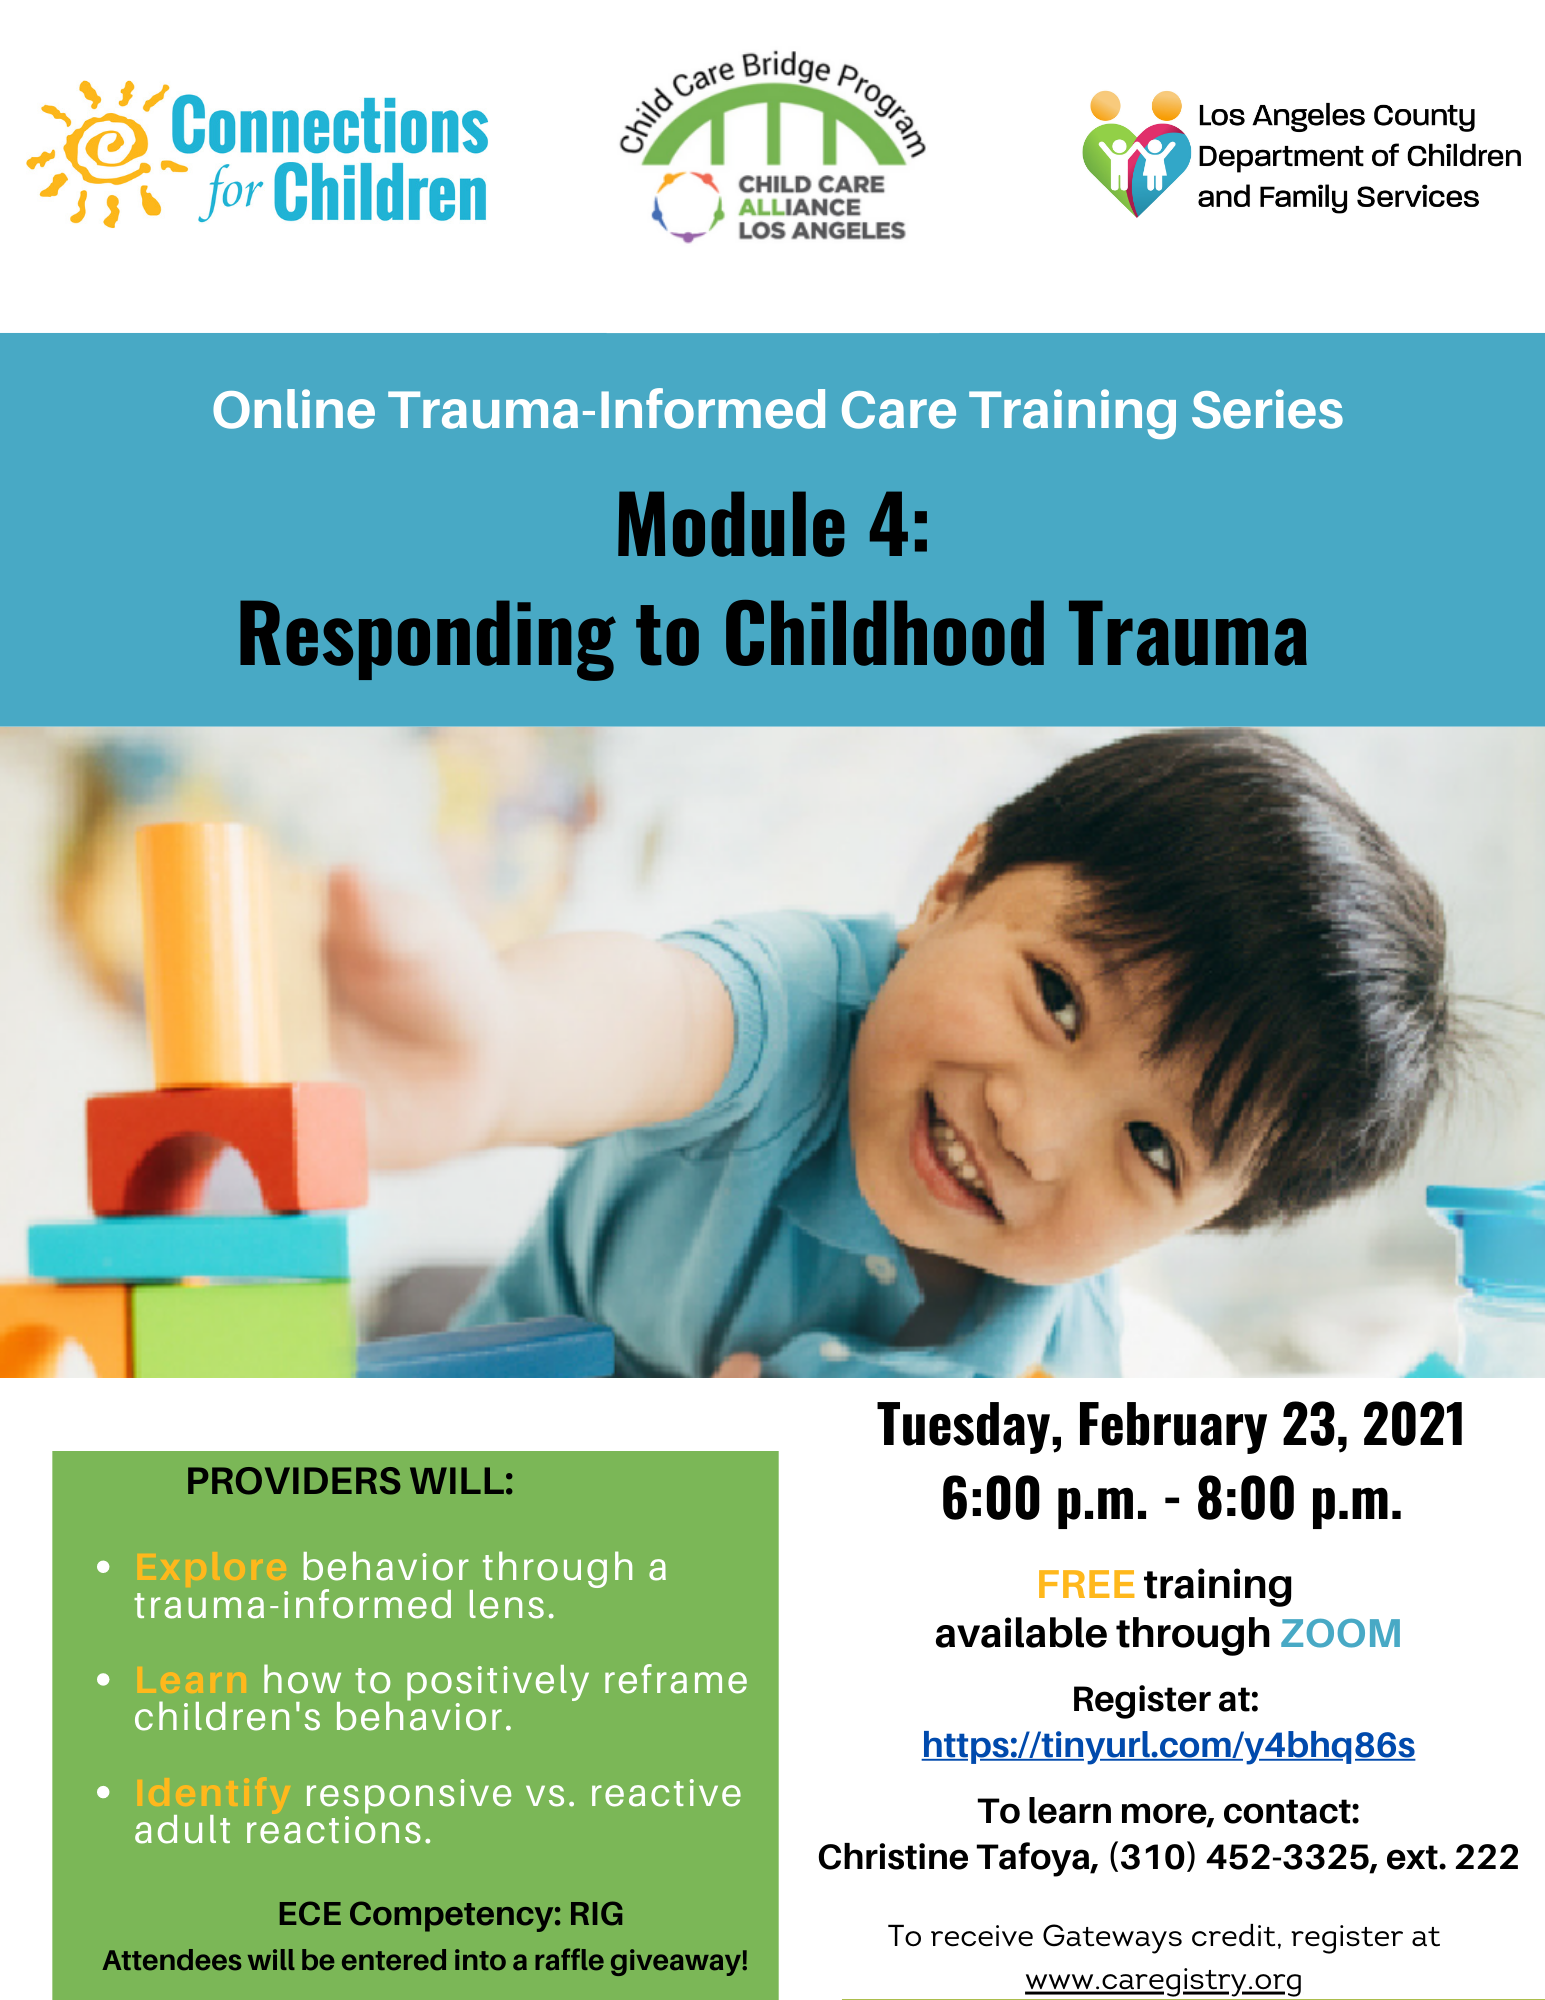 Responding to Childhood Trauma